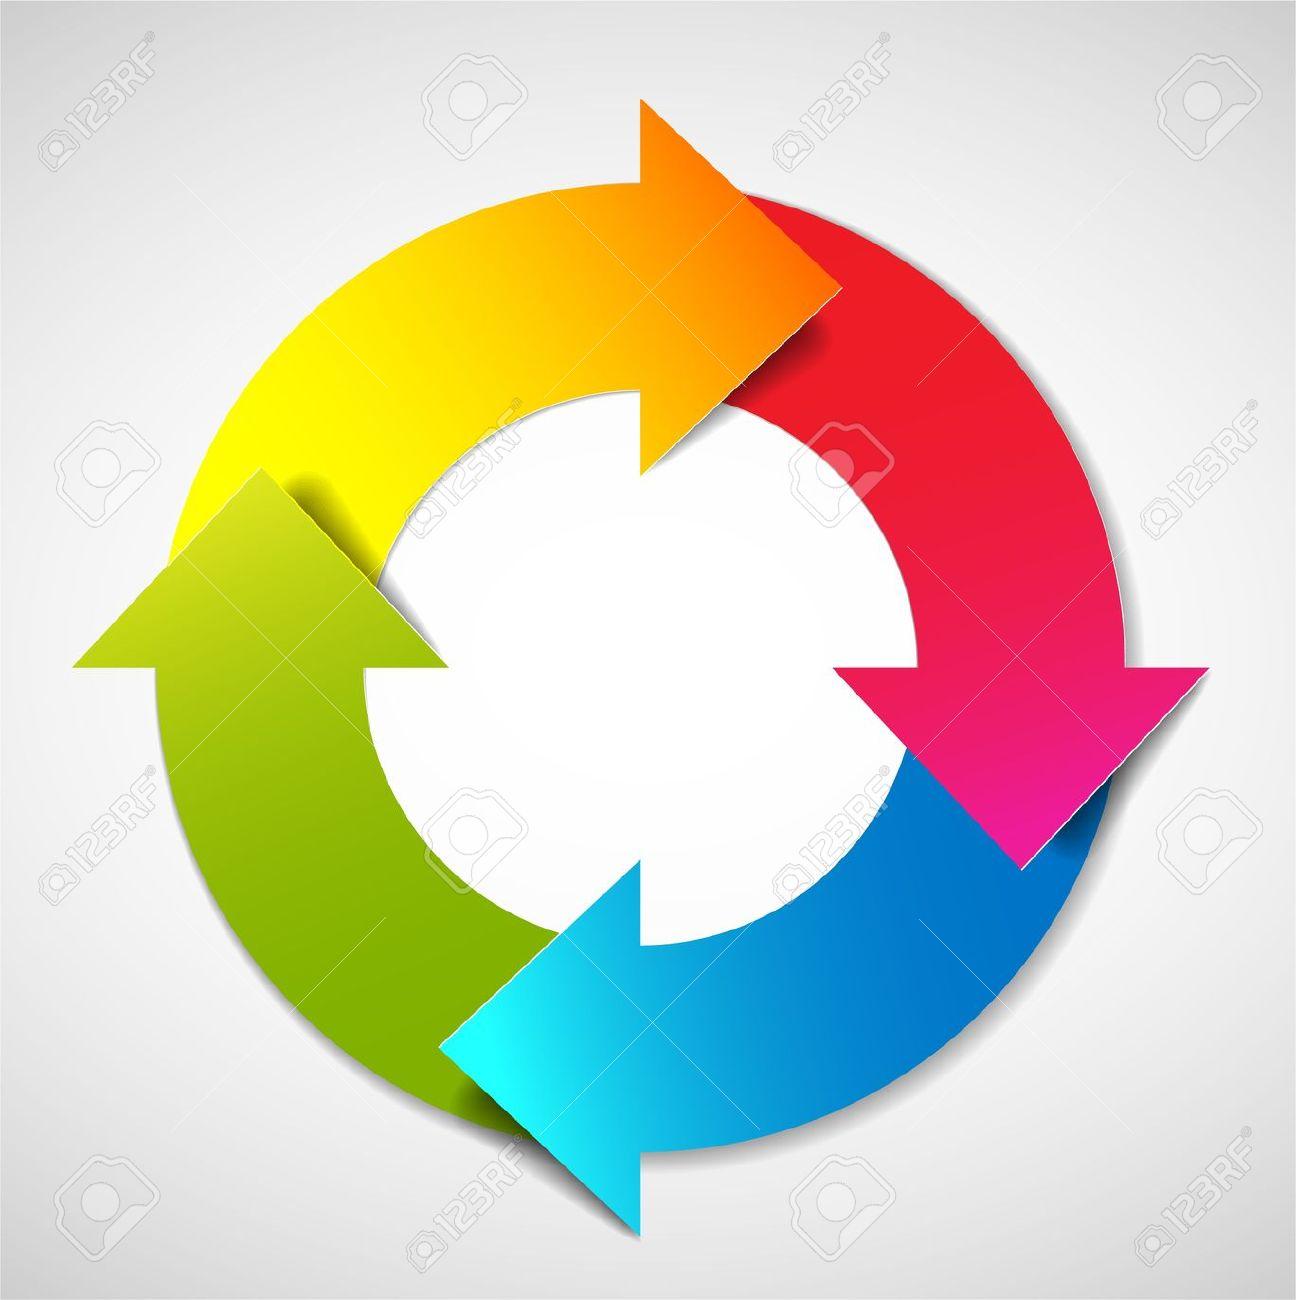 panda life cycle diagram rj11 jack wiring processes clip art clipart free images